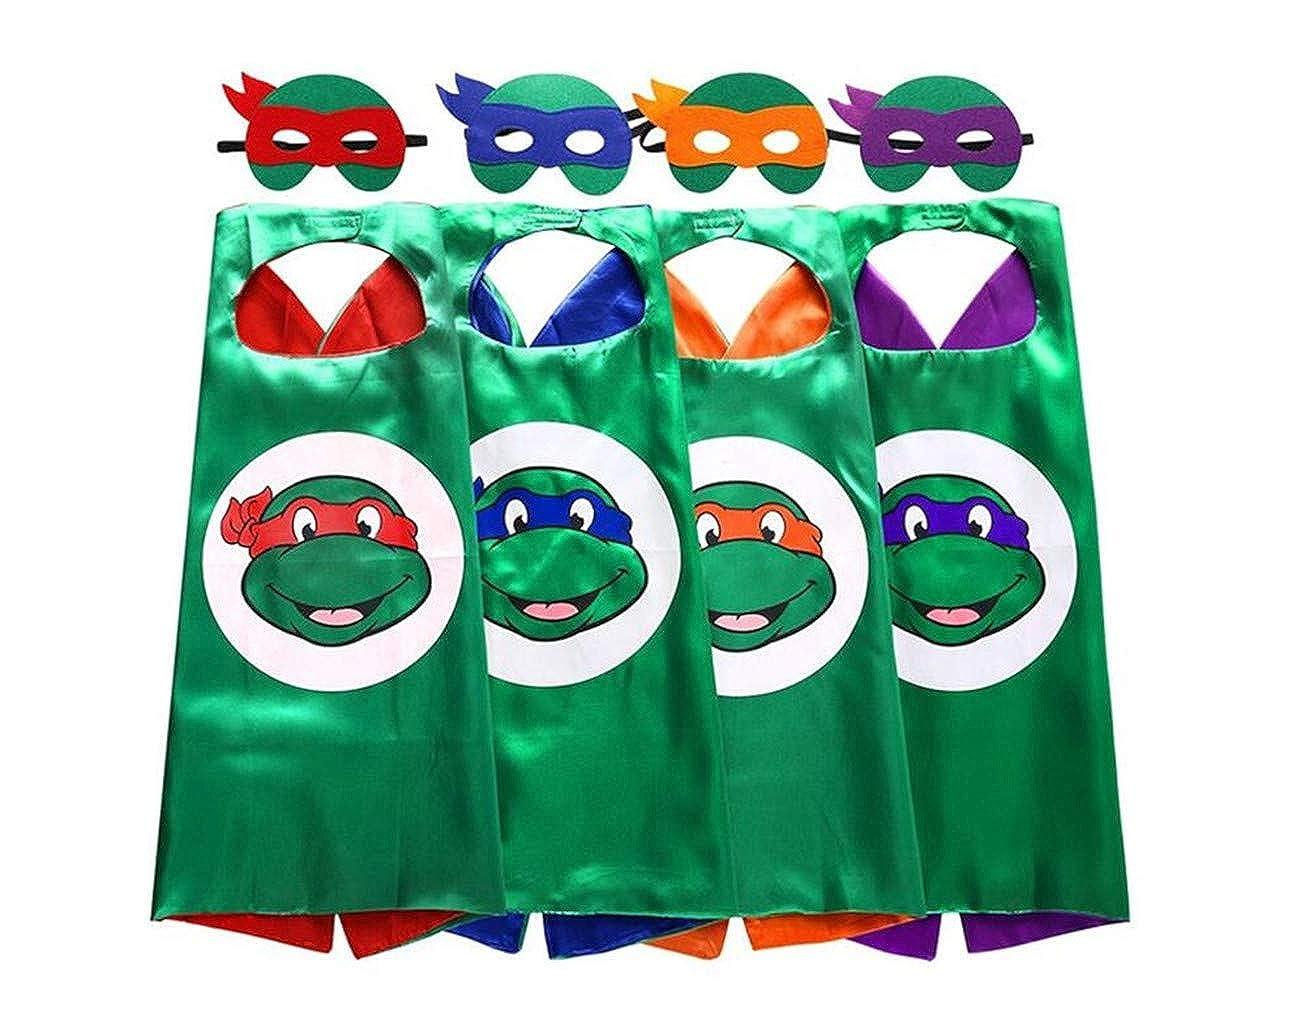 B07KN25278 Superhero TMNT Cartoon Costume 4 Thermal Pransfer Satin Cape with Felt Mask 61WIk3i5BQL